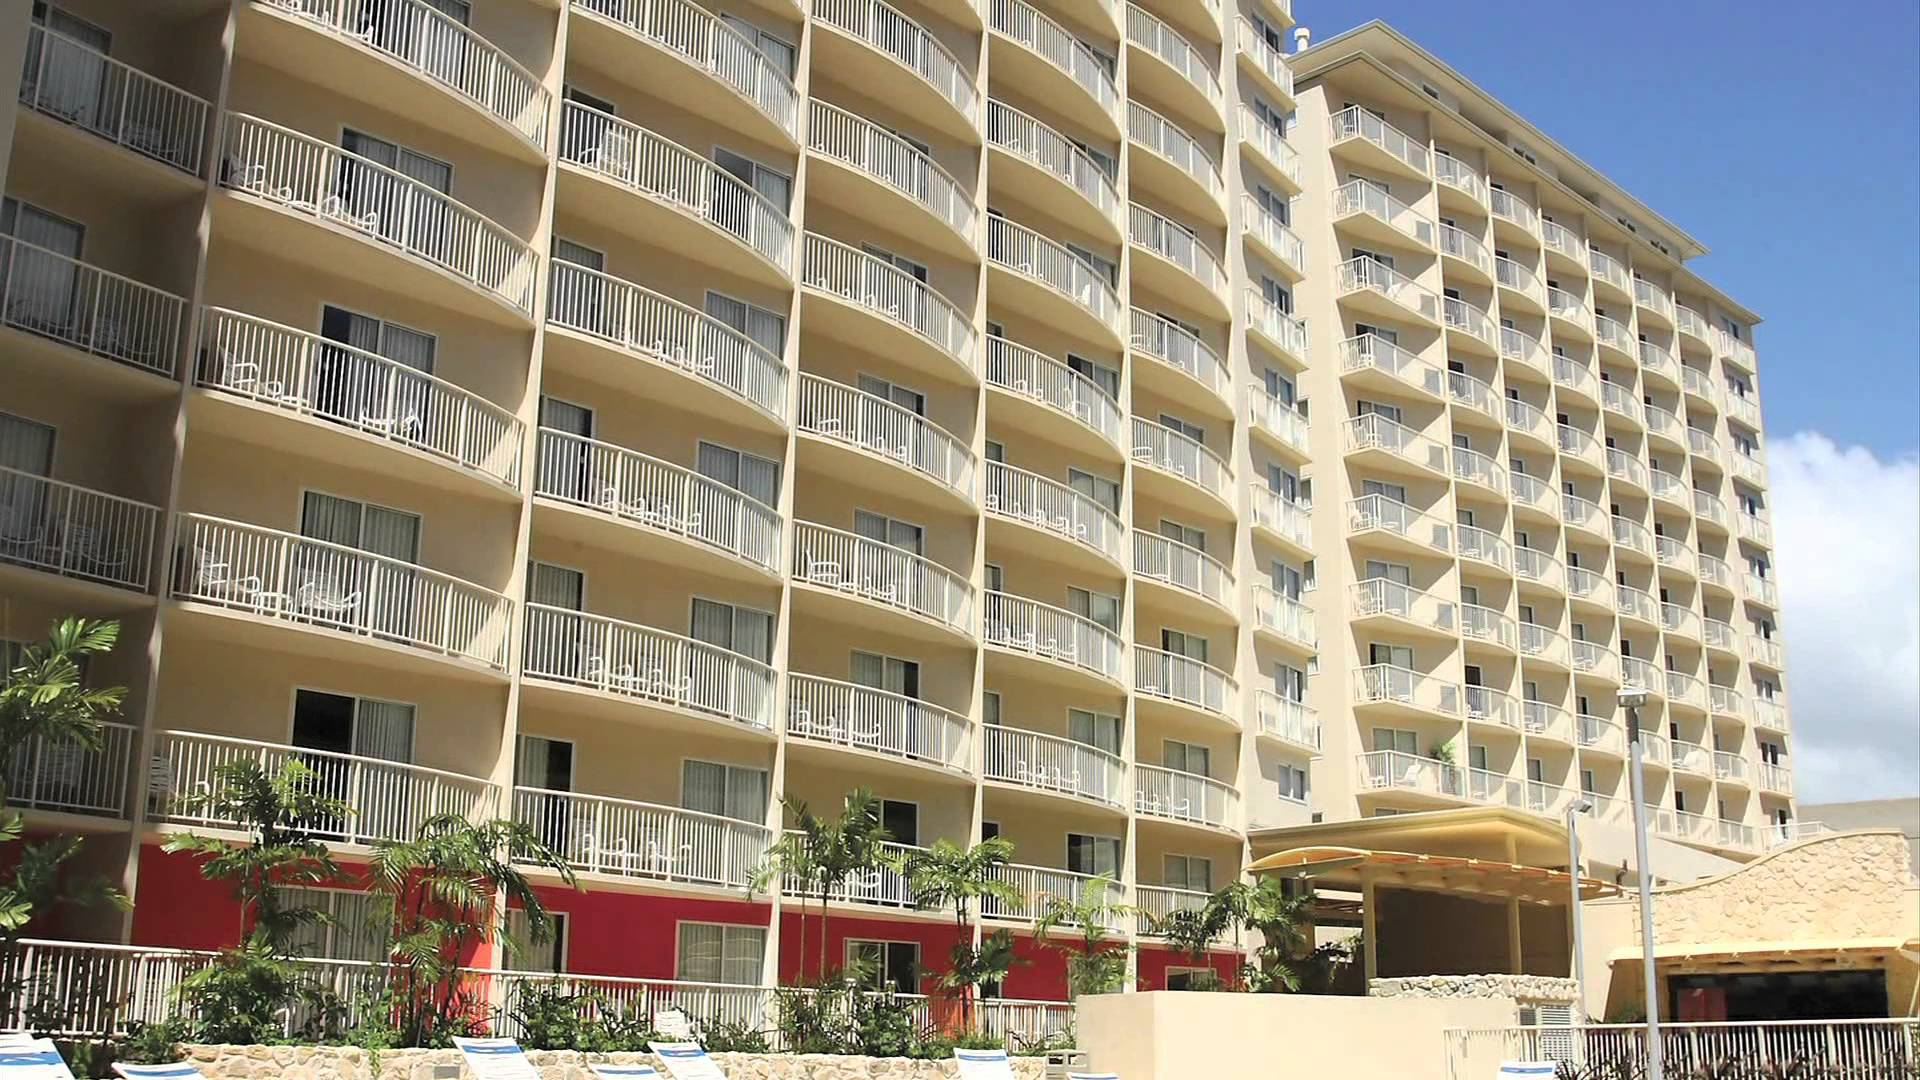 Apartment Wyndham Wakiki Beach Walk 2 Bedrooms 2 Bath photo 20214076